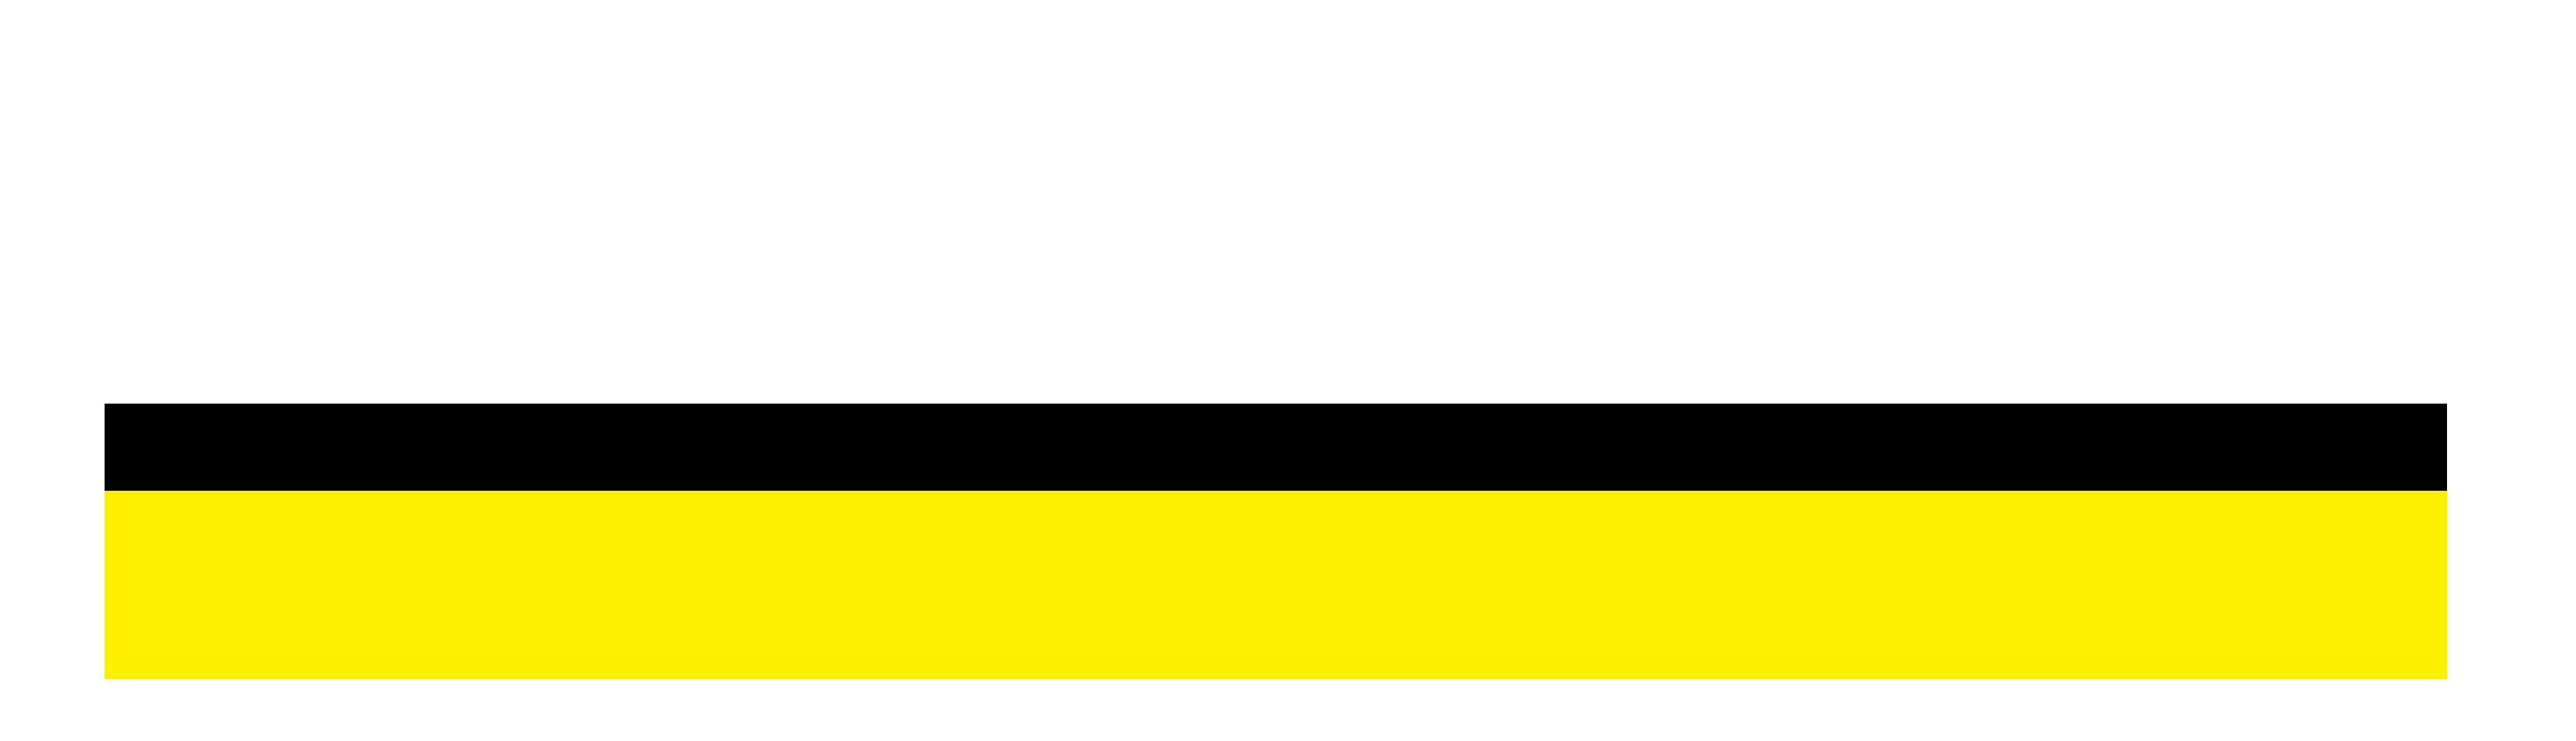 Karcher HDS 7/10.